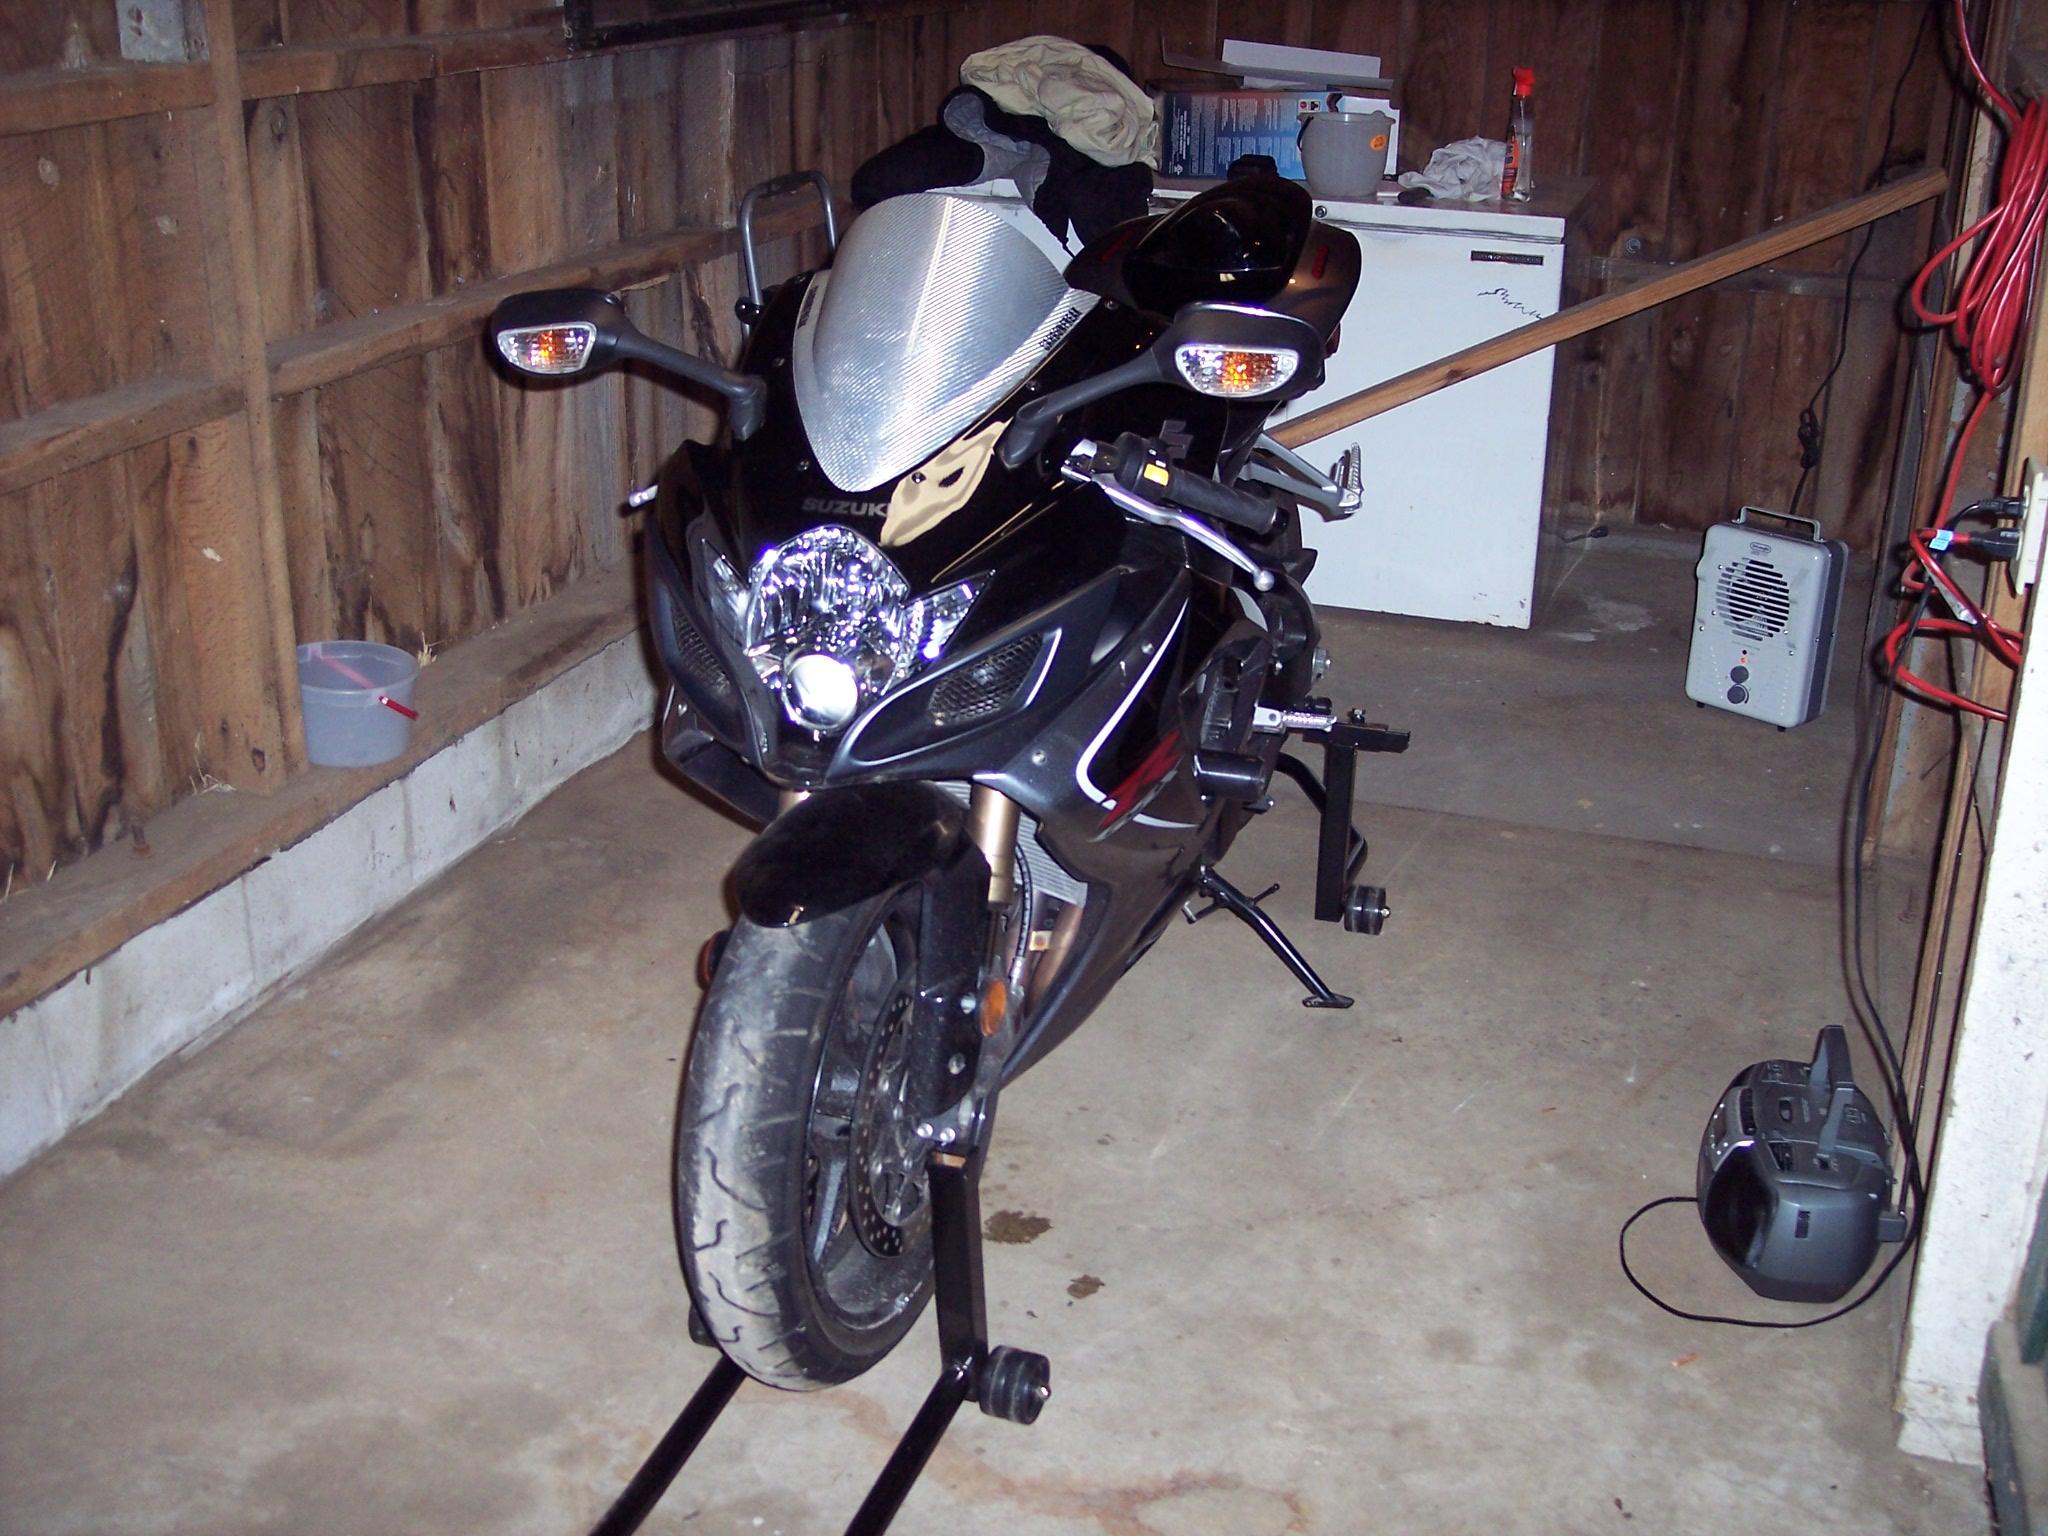 Hehehehe Worked On My Motorcycle Garage Today